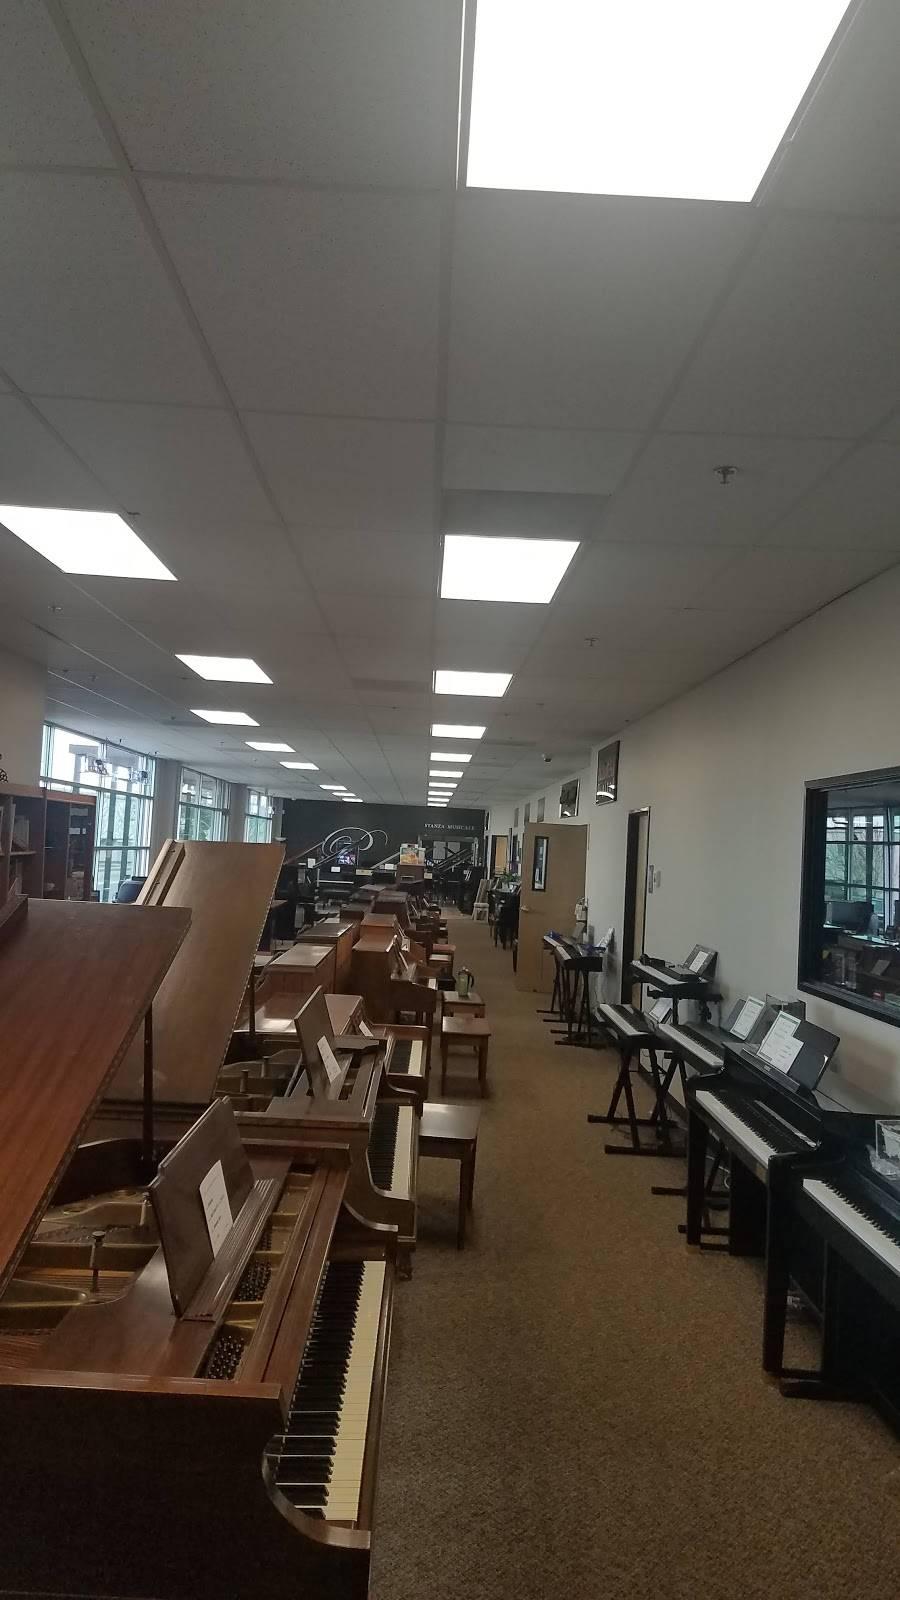 Portland Piano Company - electronics store  | Photo 4 of 9 | Address: 8700 NE Columbia Blvd, Portland, OR 97220, USA | Phone: (503) 775-2480